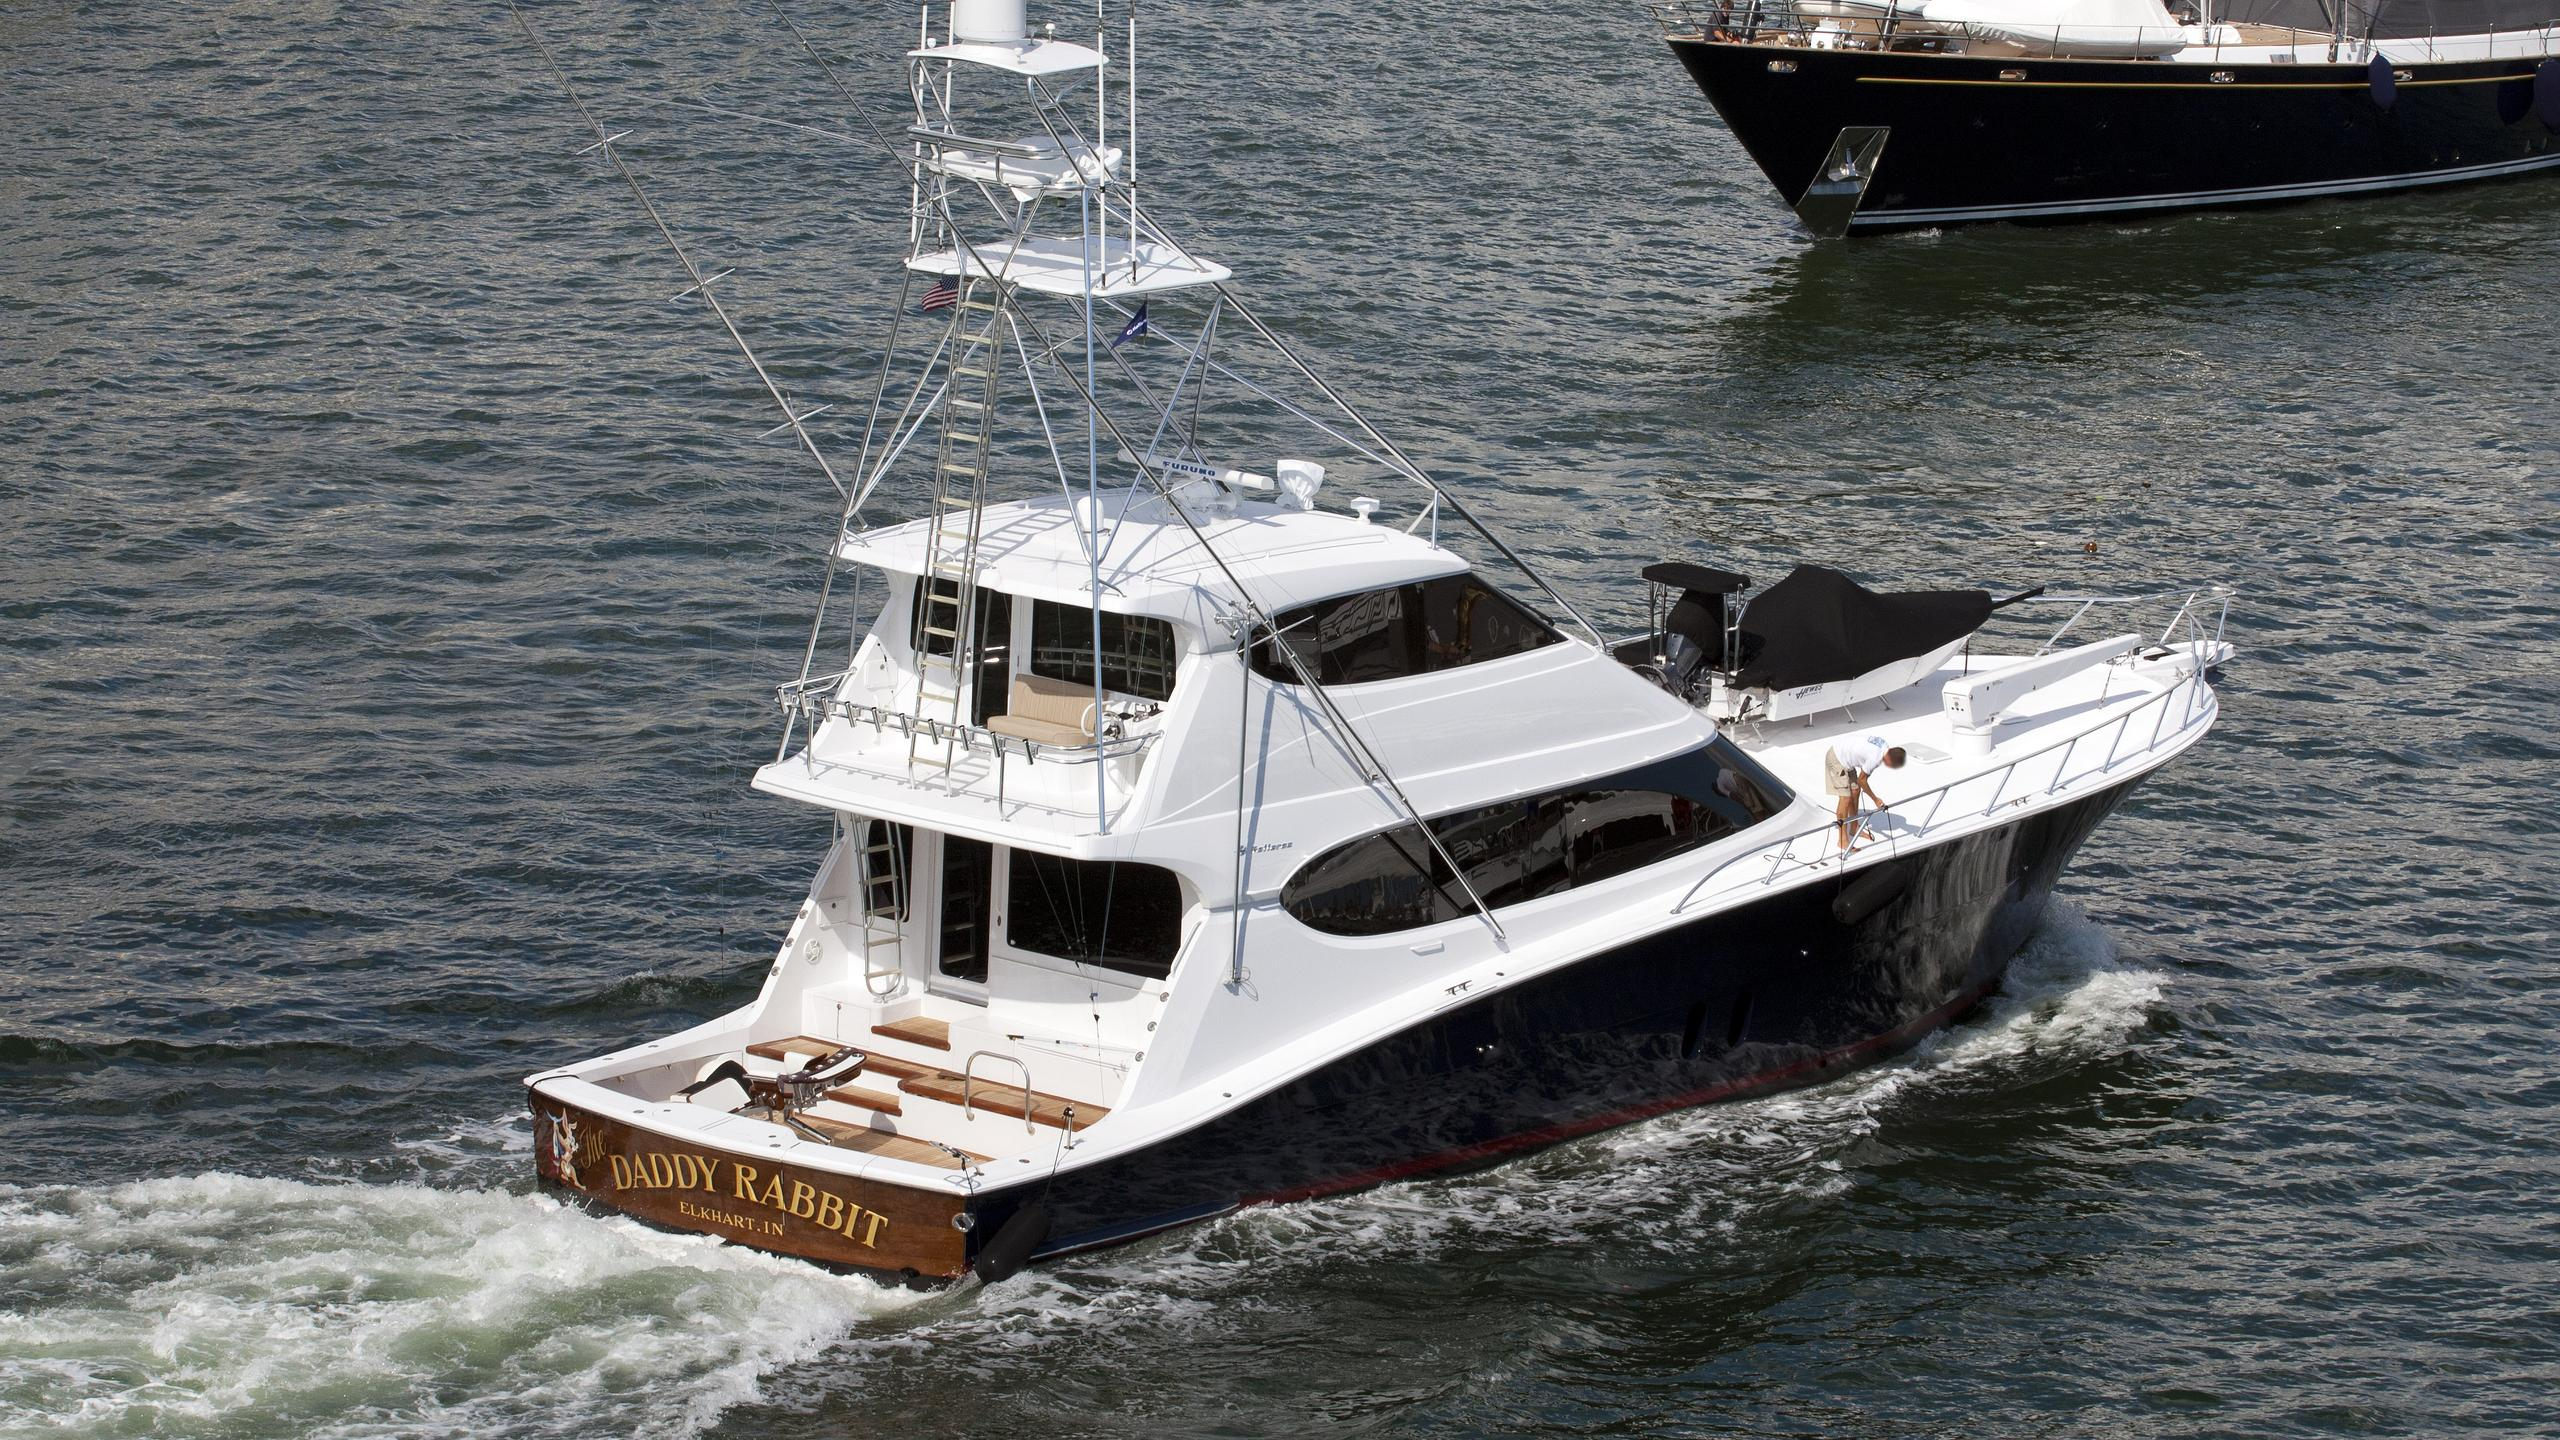 daddy-rabbit-motor-yacht-hatteras-2009-24m-cruising